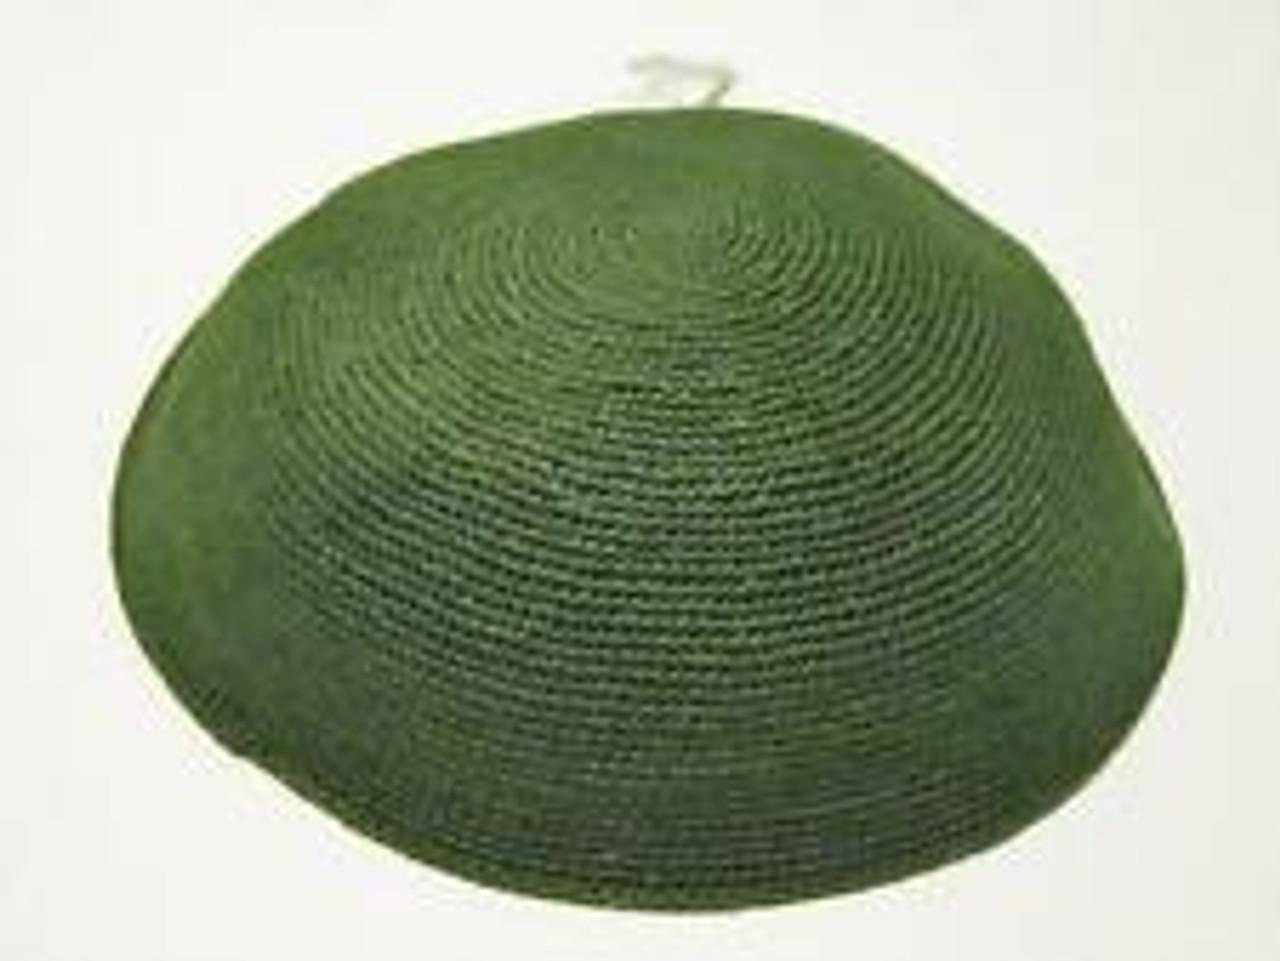 Green DMC Knitted Kippah